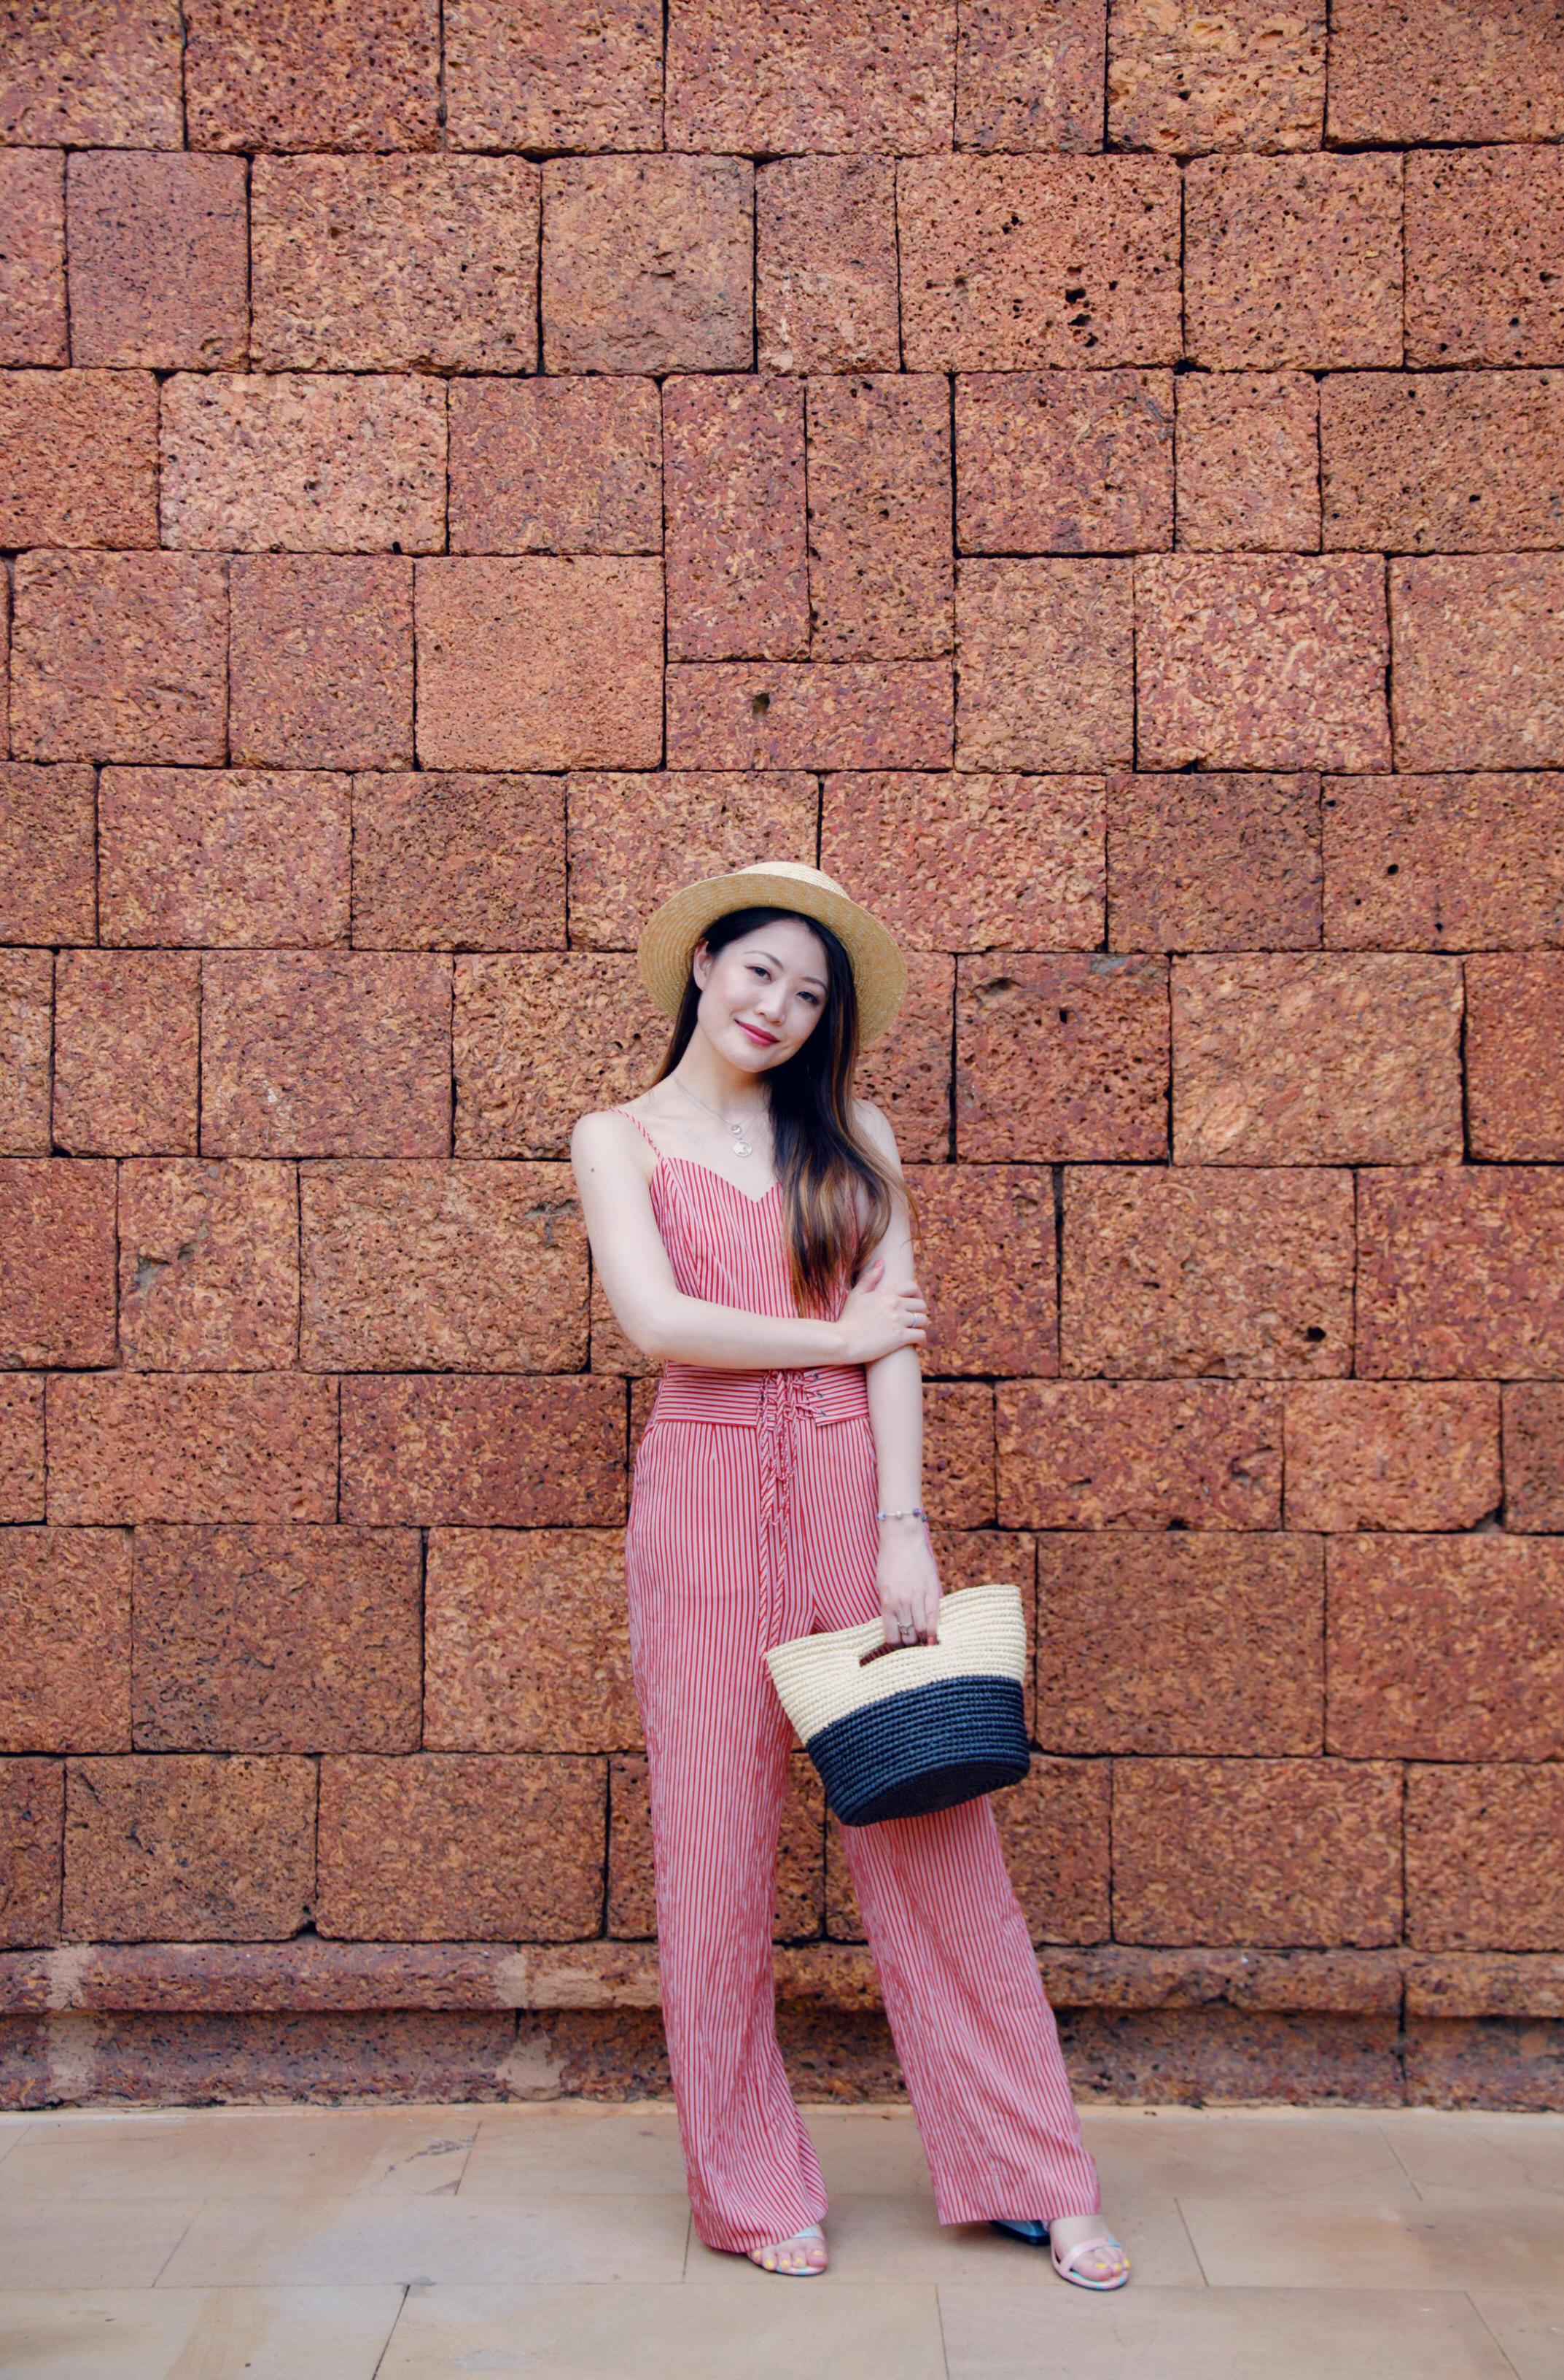 Heelsonthego Cambodia travel Siem Reap